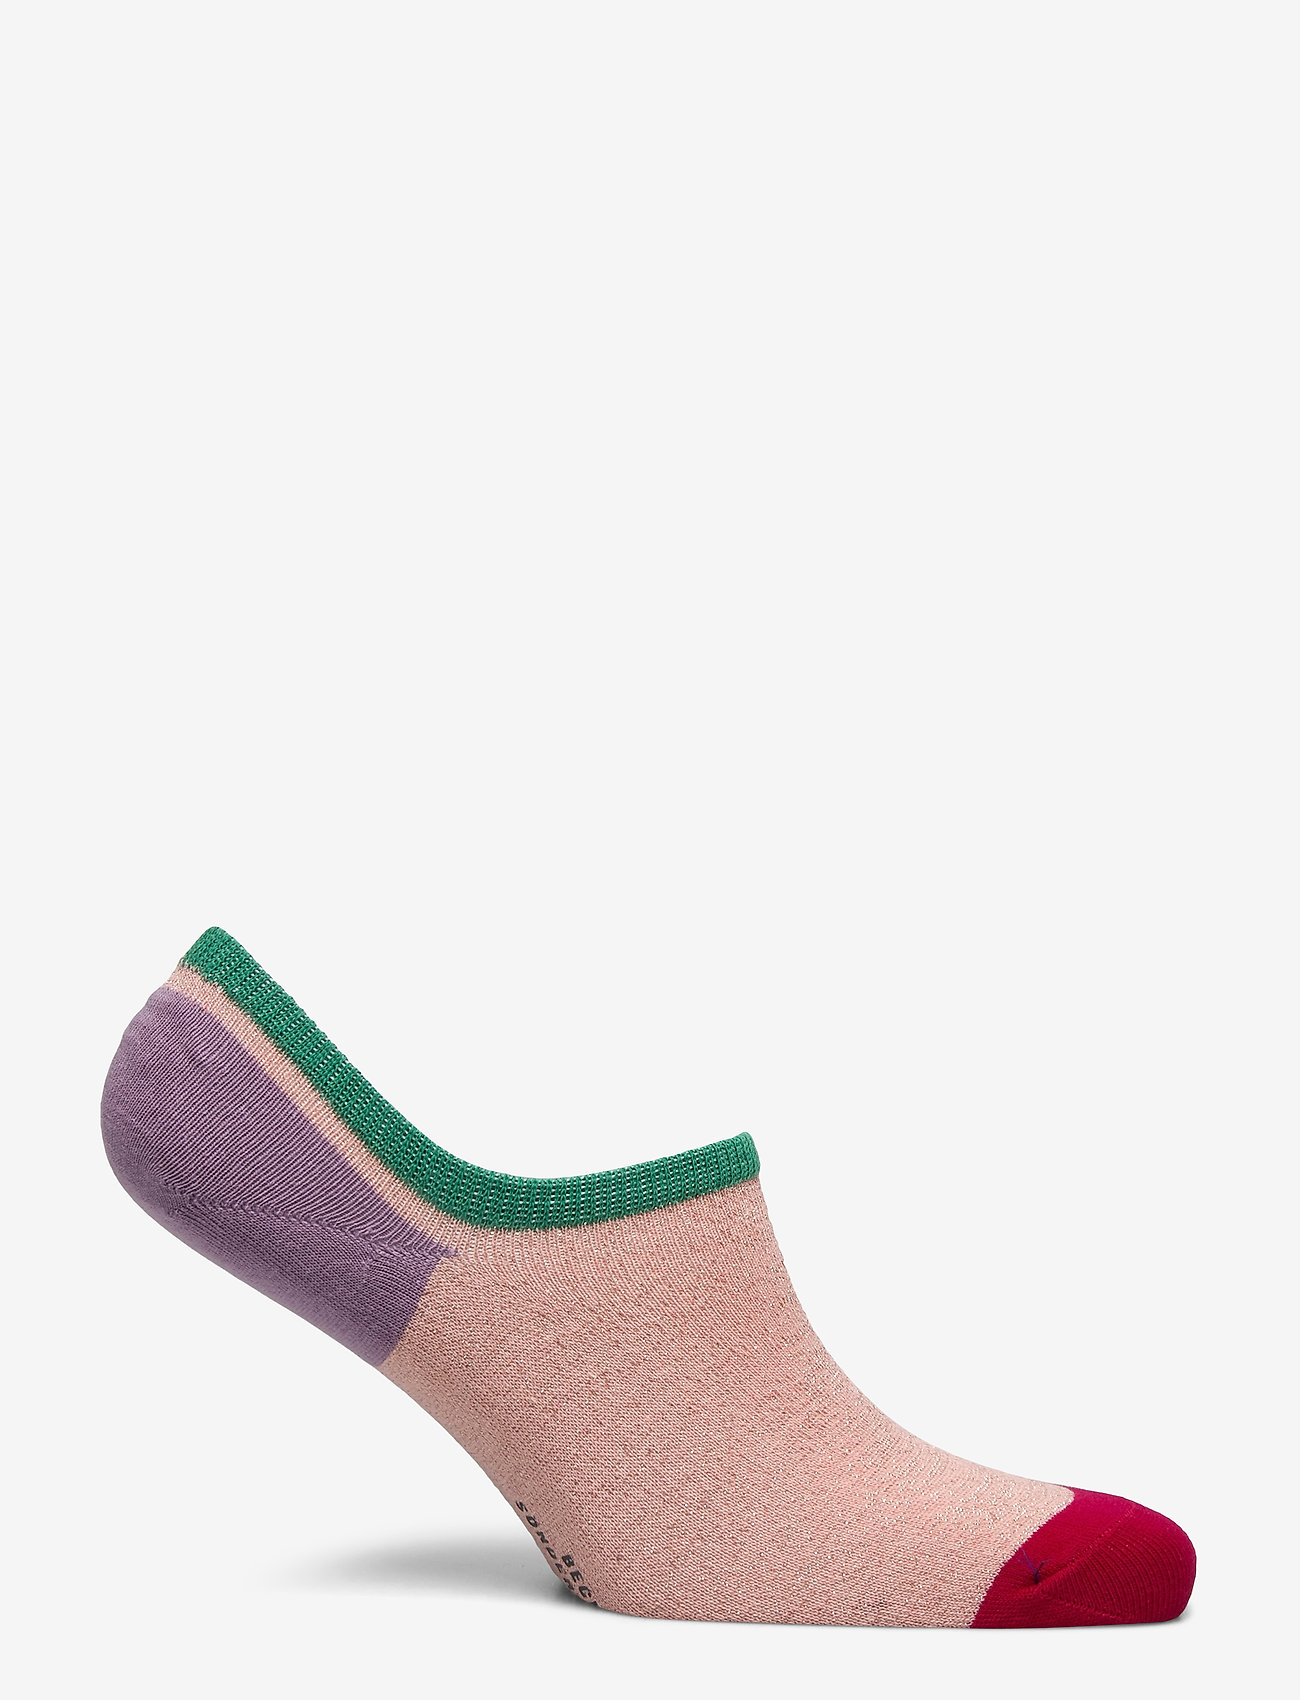 Becksöndergaard - Mix Sock Pack W.10 - steps & footies - dustypink/dusty - 1